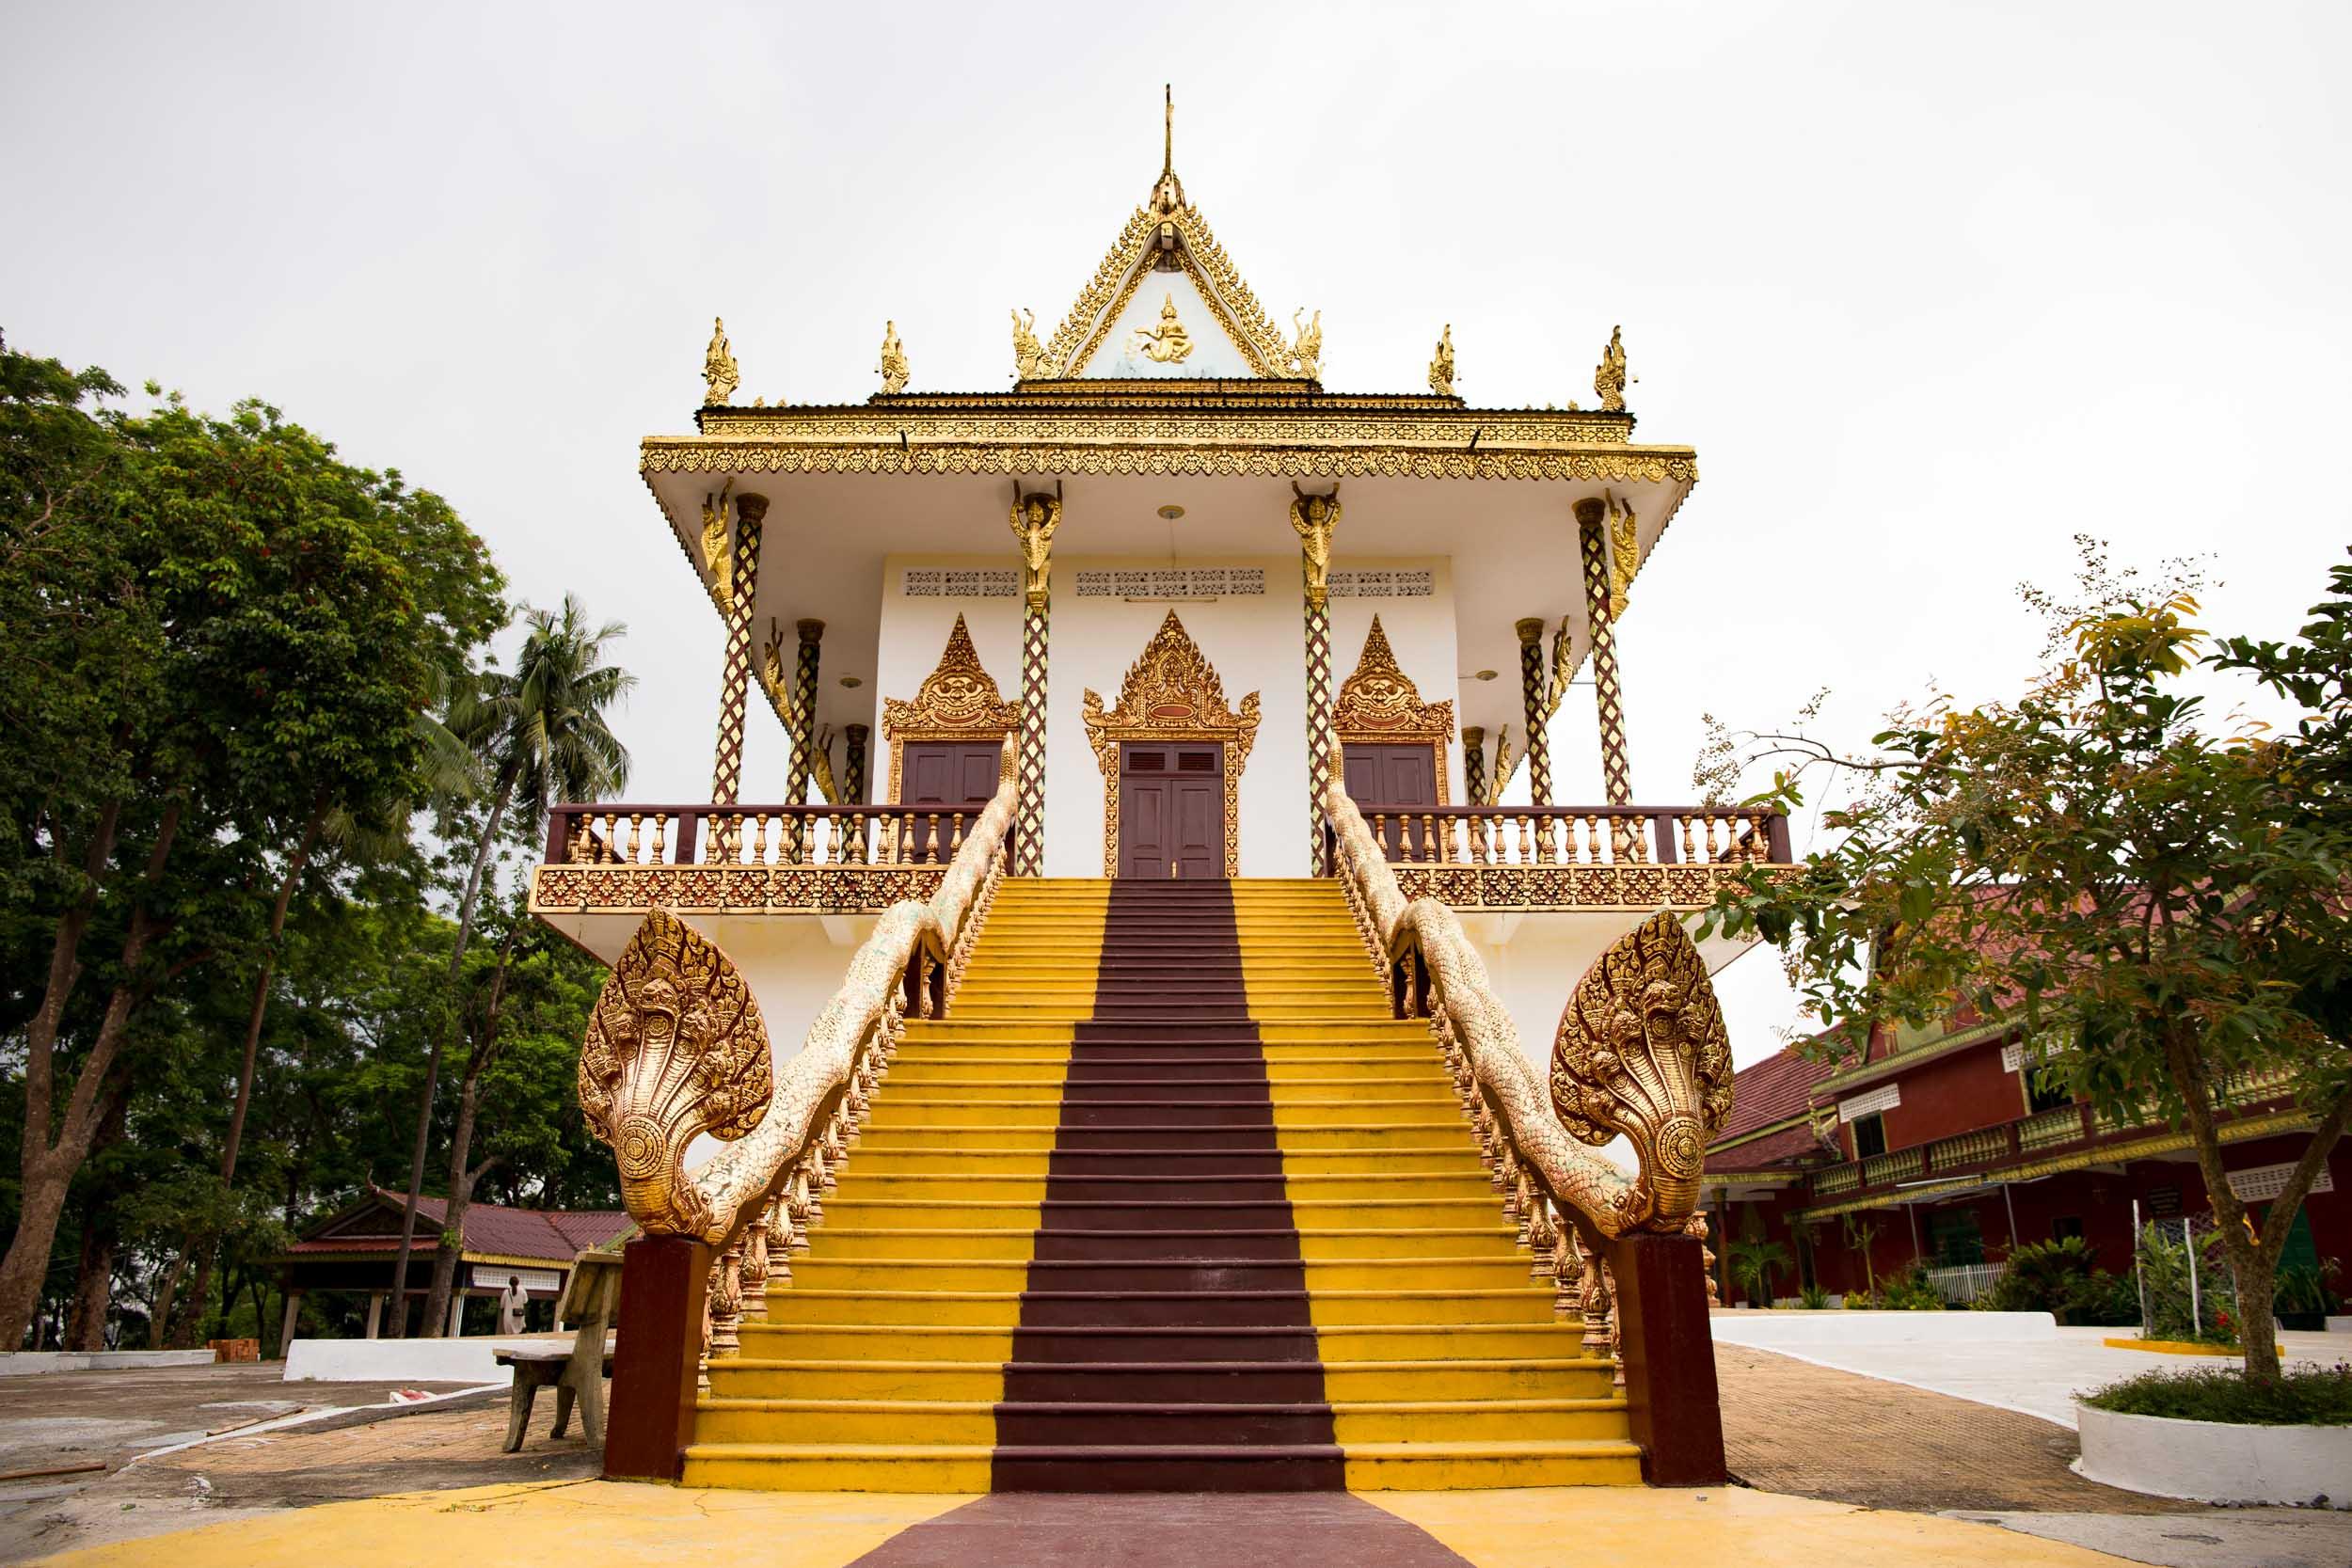 Buddha Temple - Sihanoukville, Cambodia - Rupert Turkington Travel Photography